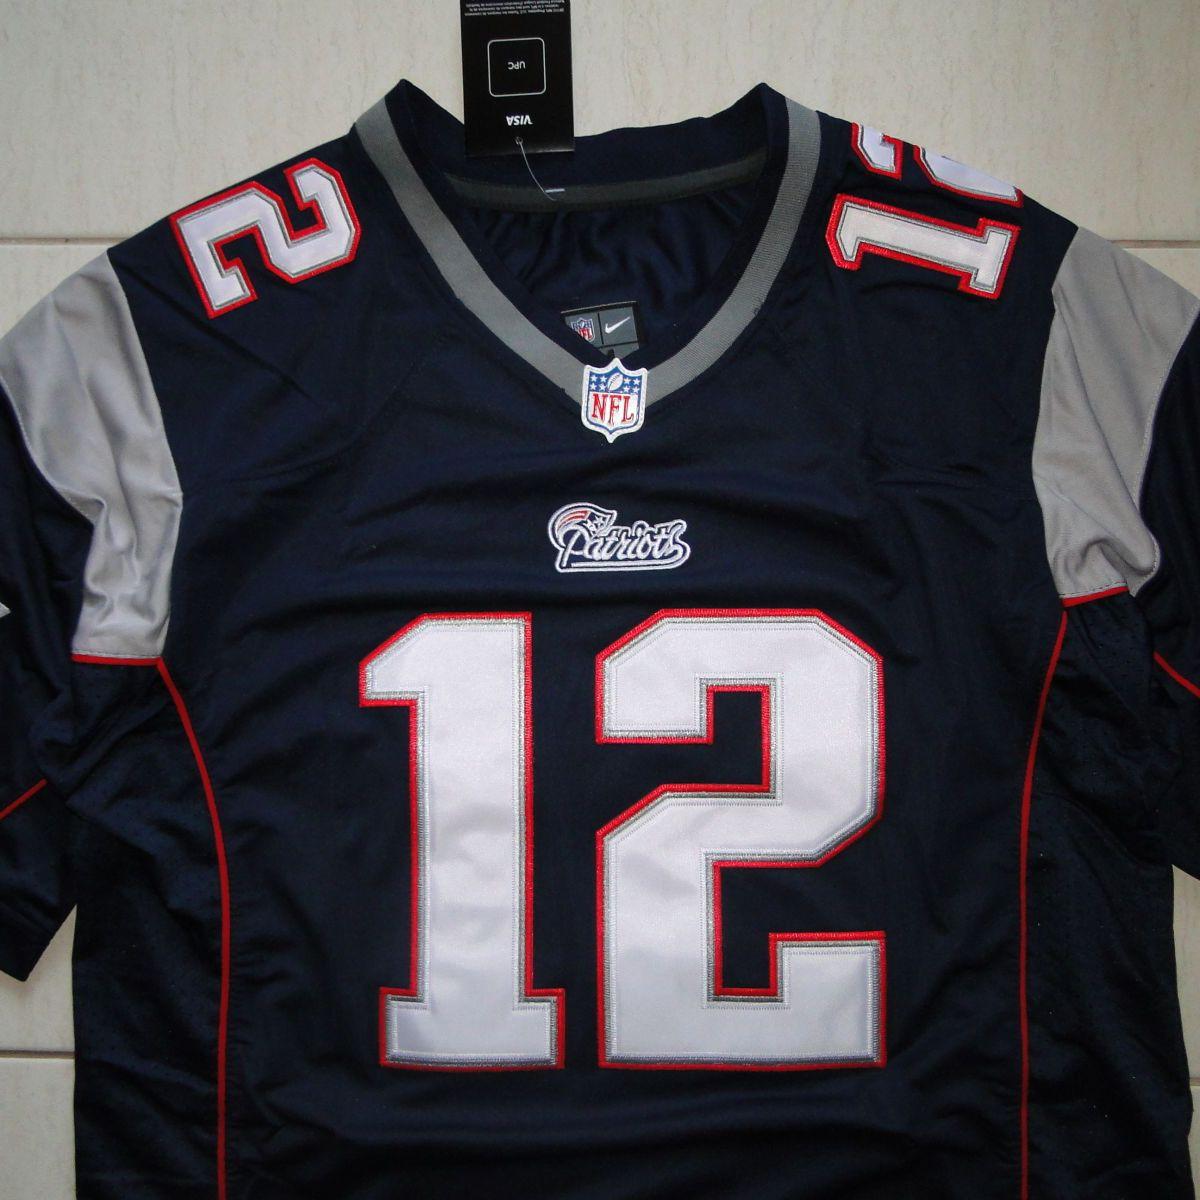 f9a64667c Camisa Futebol Americano Nfl Tom Brady New England Patriots